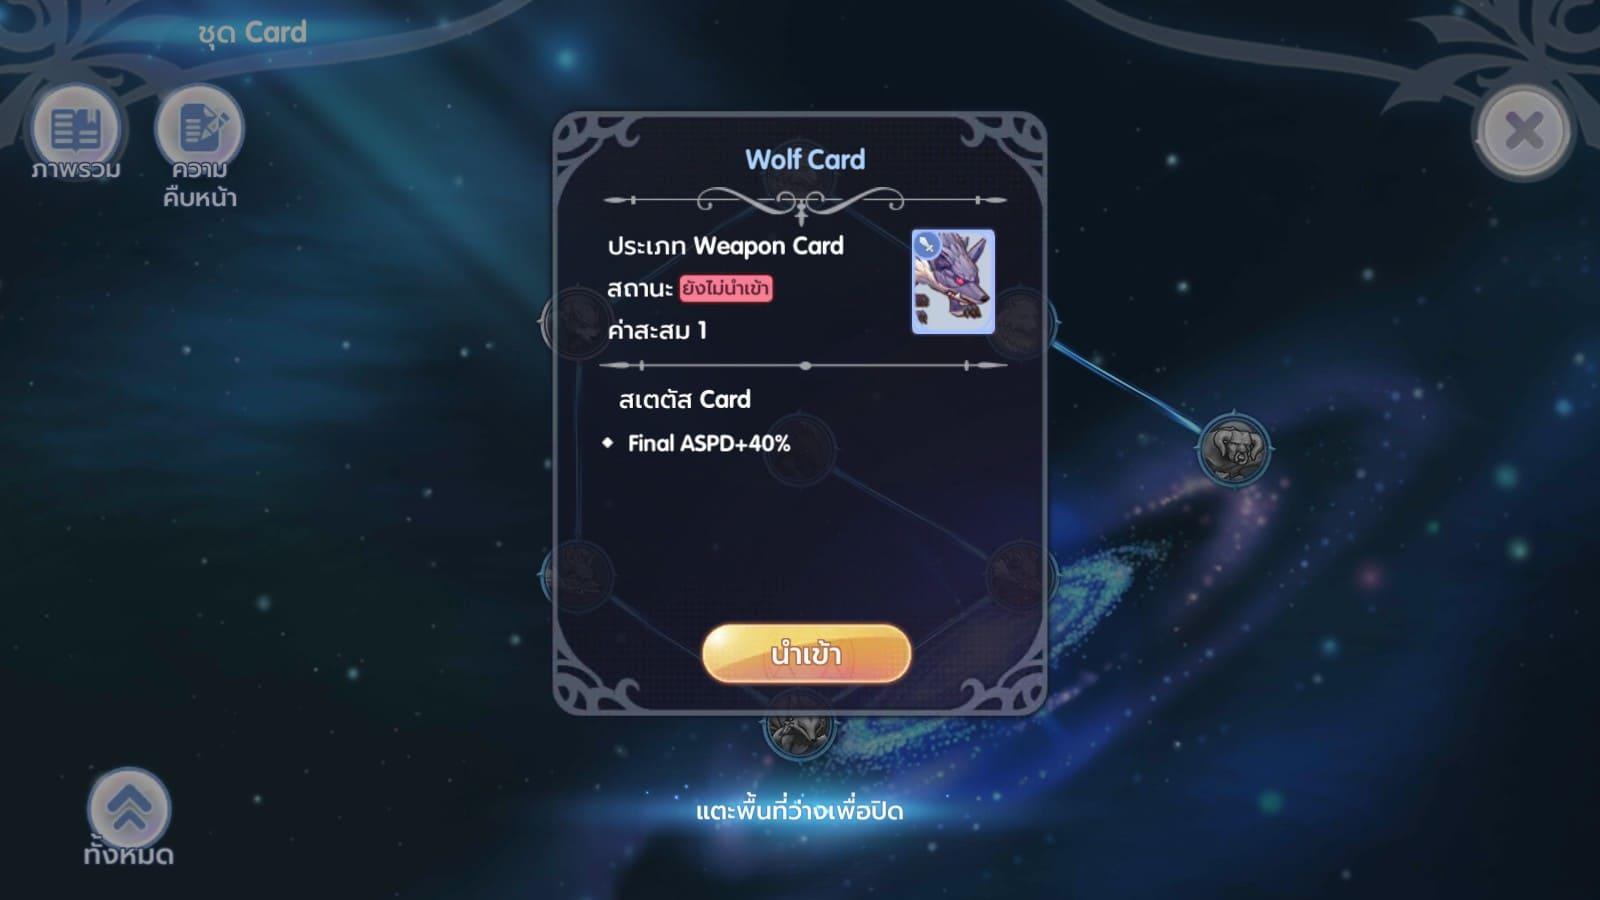 ROX - Wolf Card